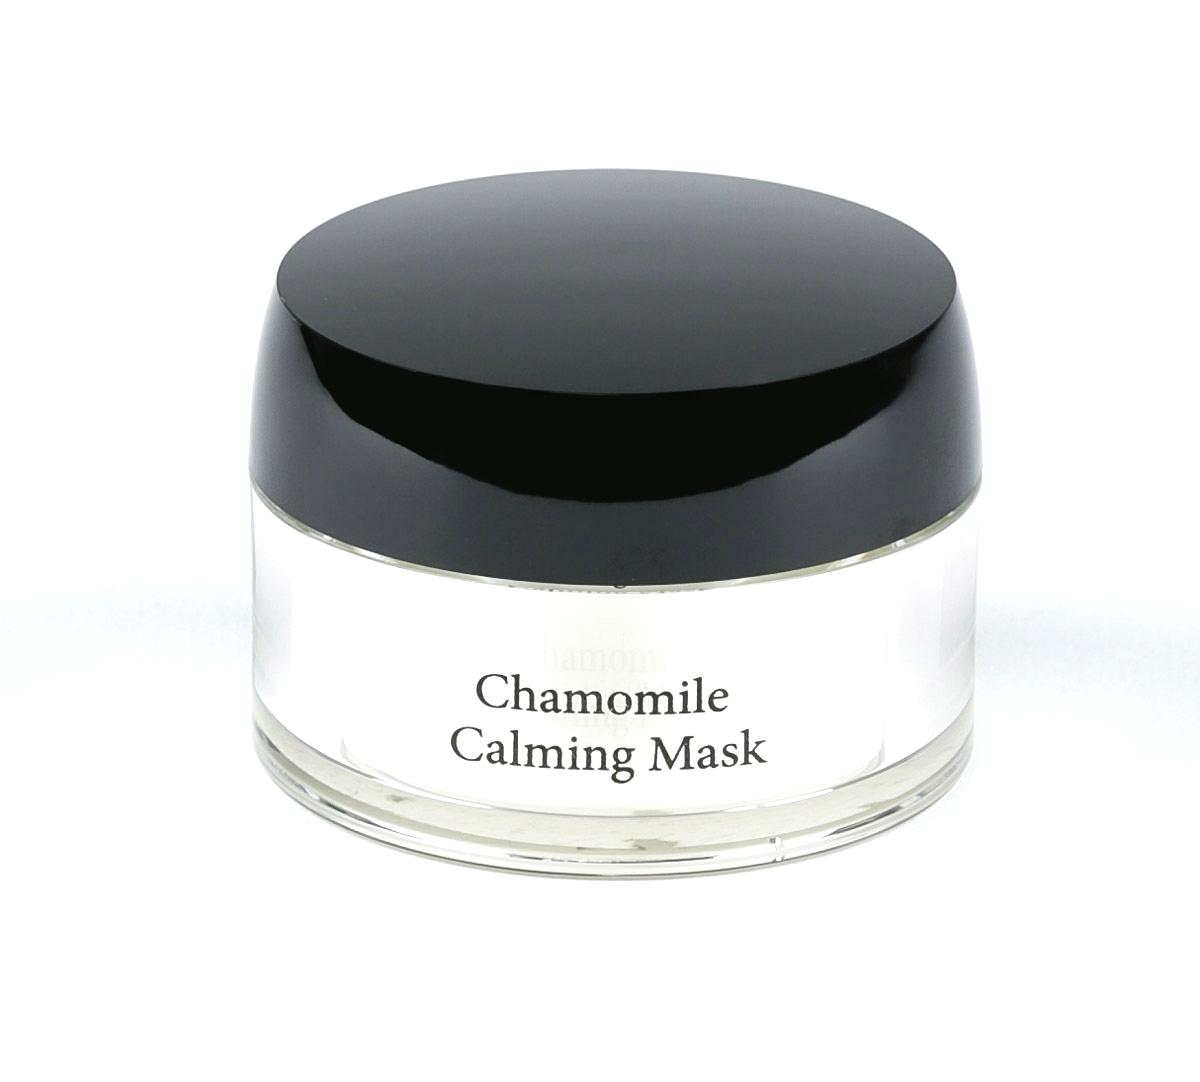 CHAMOMILE CALMING MASK